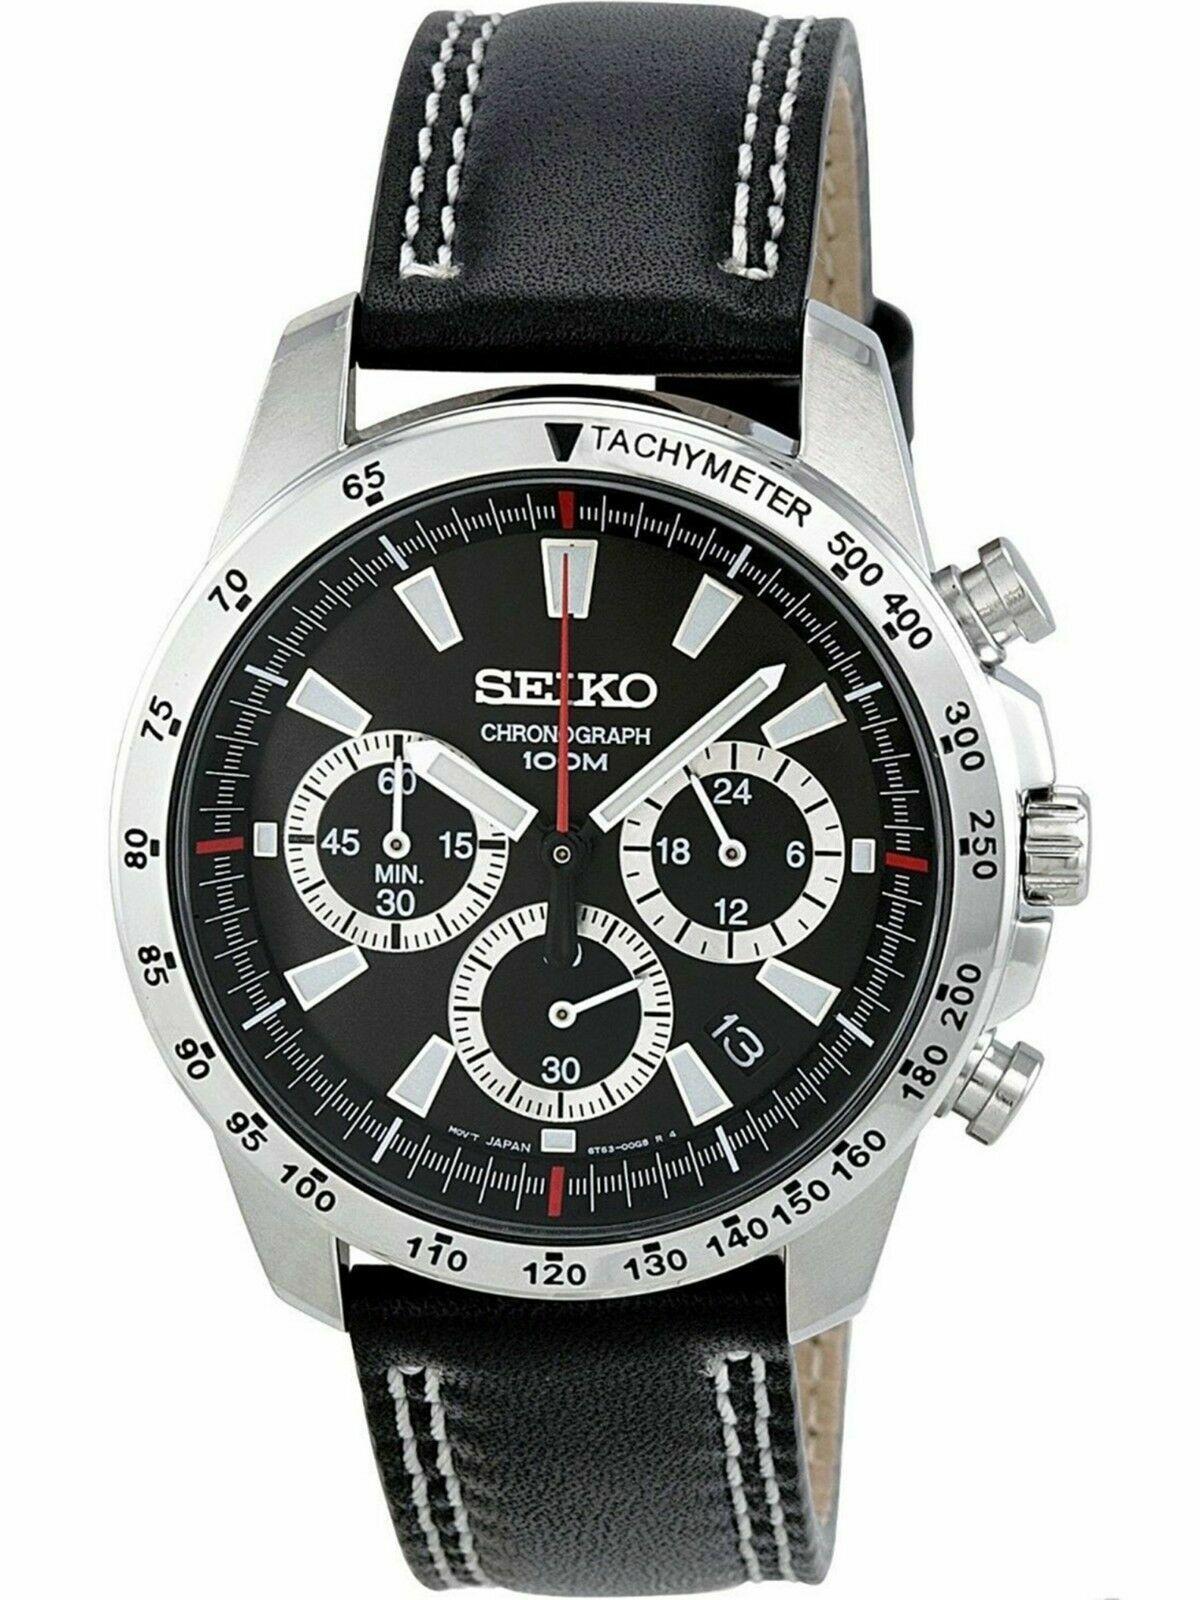 Seiko SSB033 Japan Quartz Chronograph Black Leather 100m Men